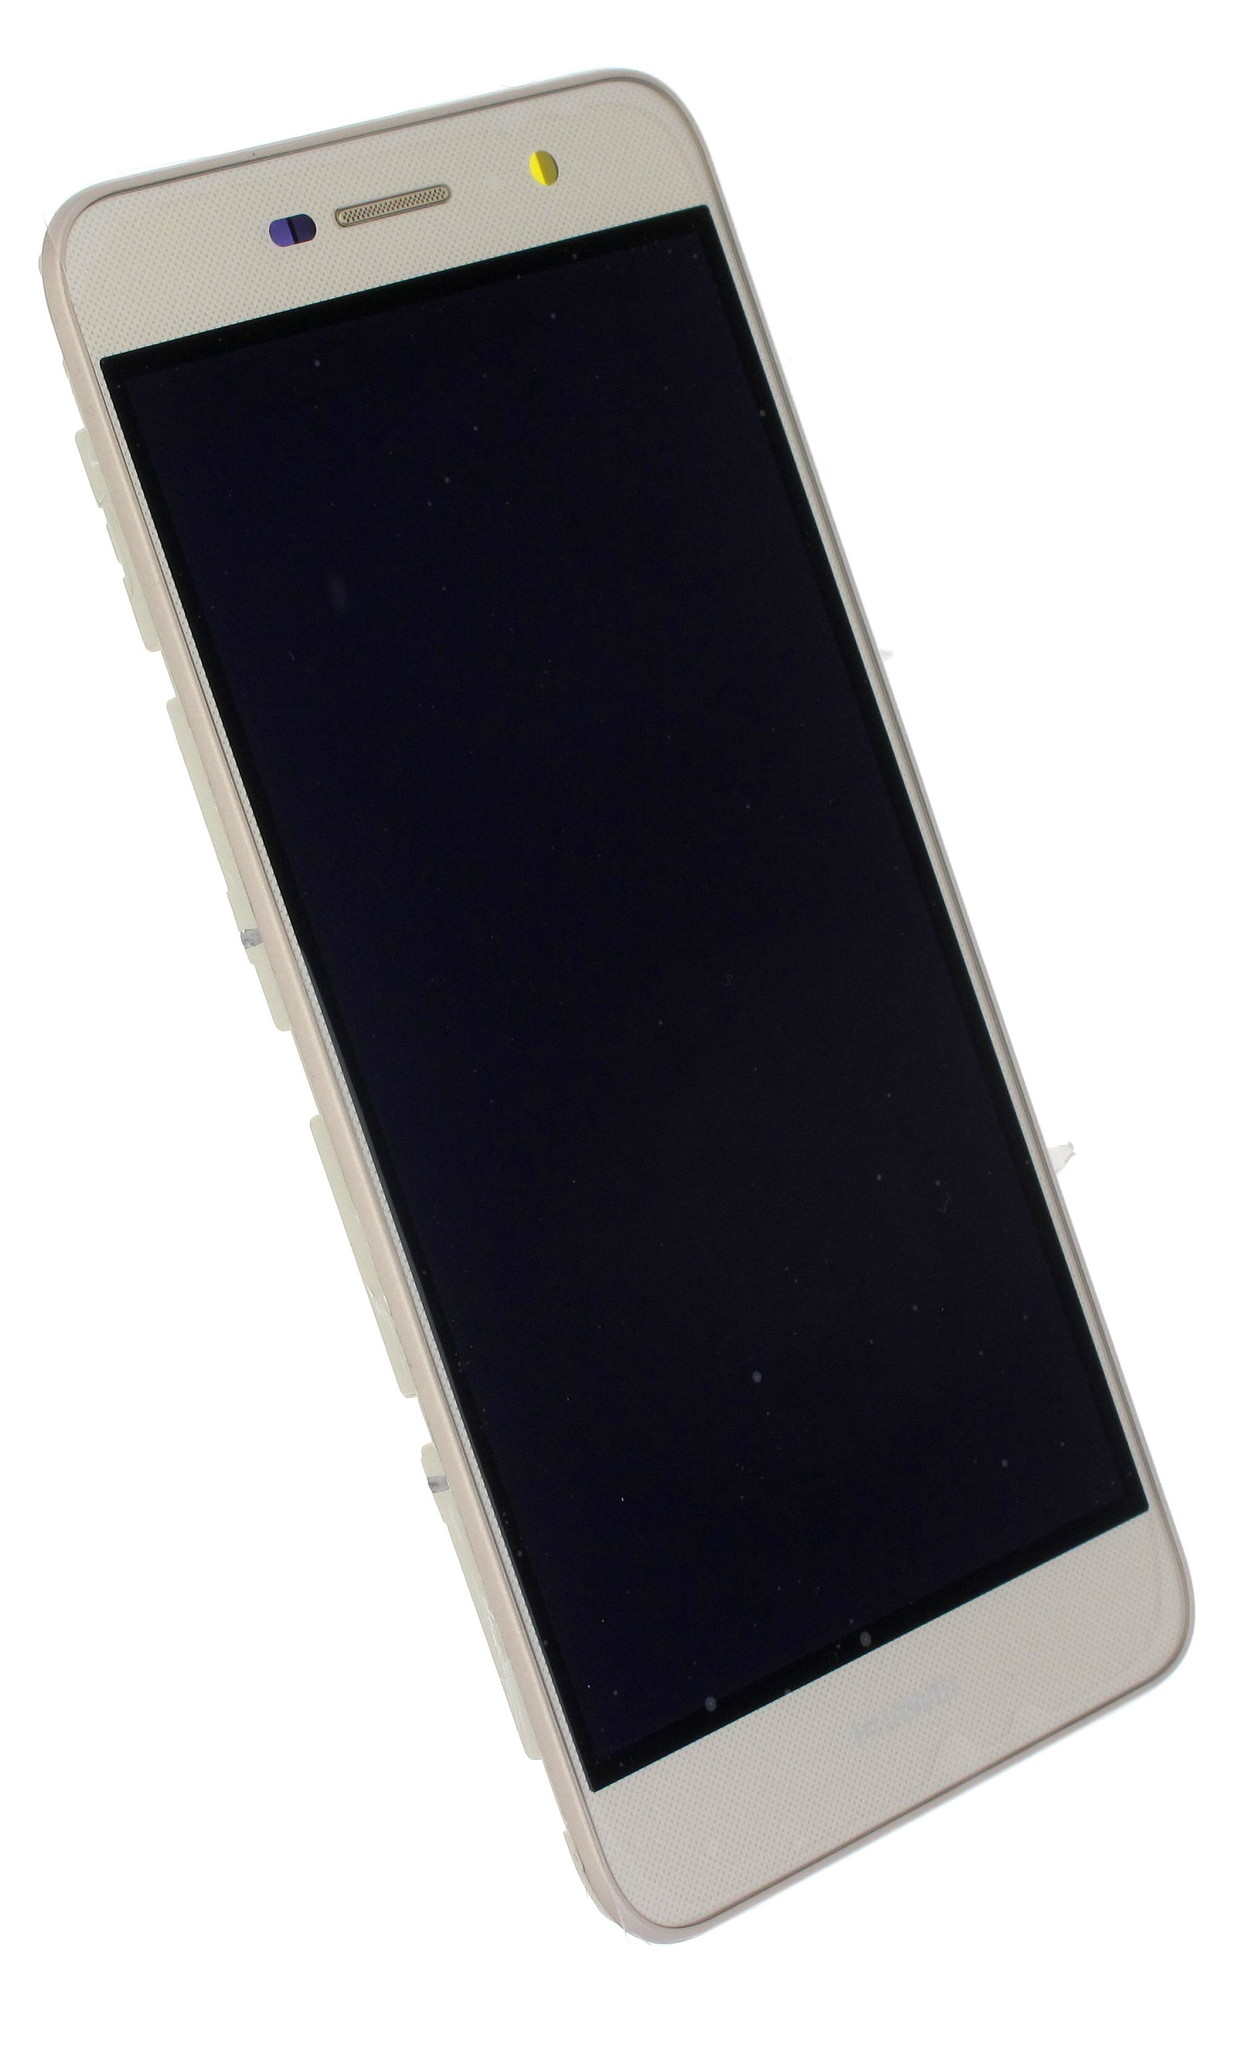 Huawei Y6 Pro 4G (TIT-AL00) LCD Display Module, Gold, 97070MDR